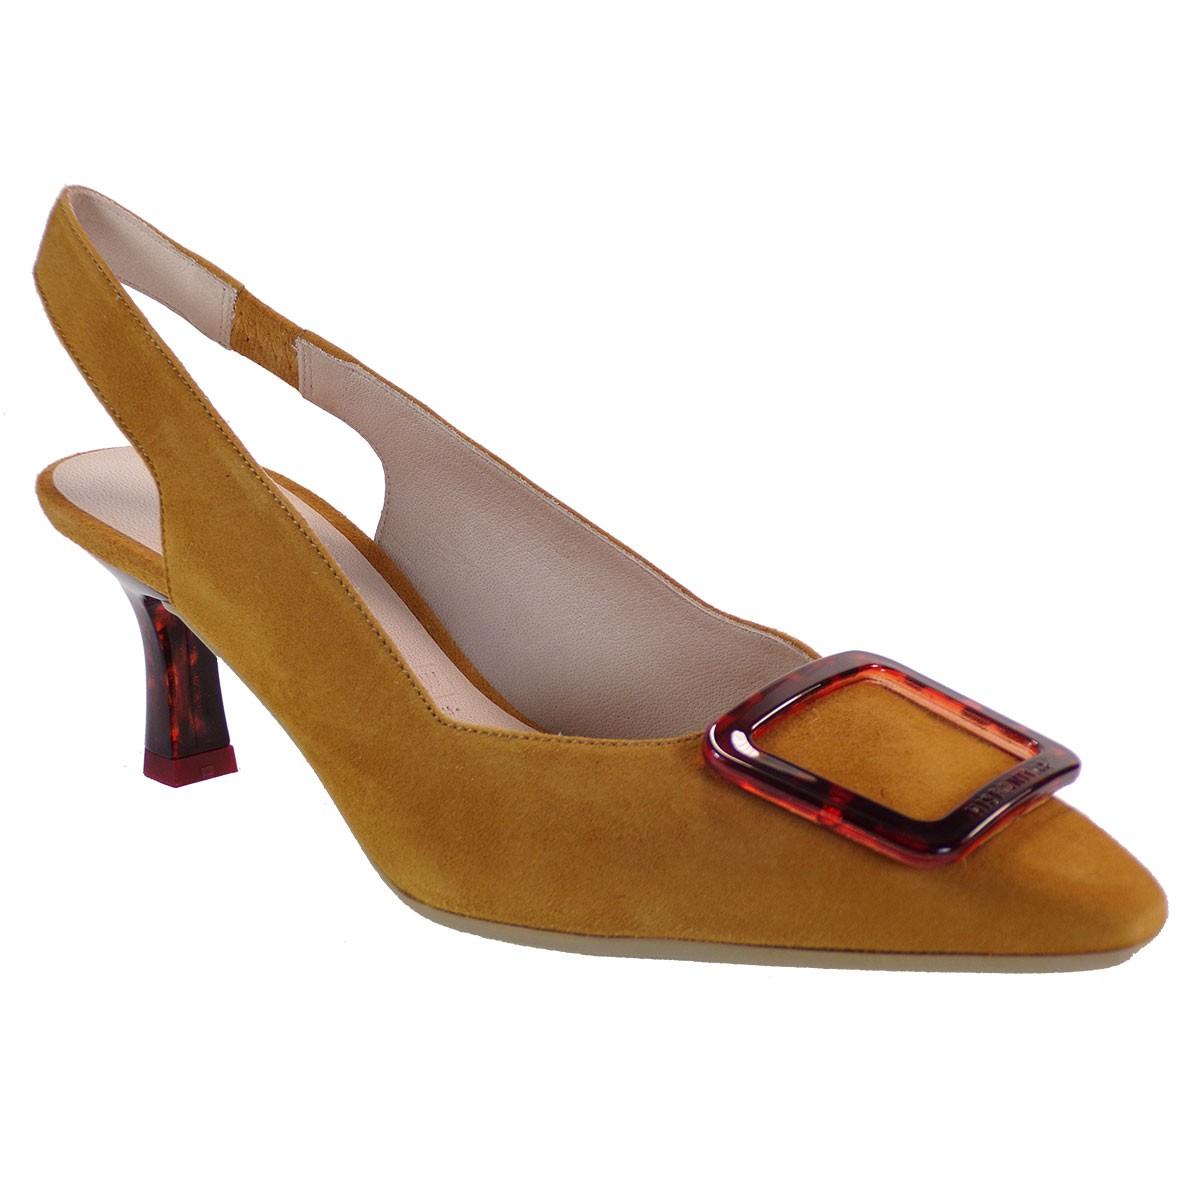 Hispanitas Γυναικεία Παπούτσια Mule Γόβες YHV09928 Ταμπά Δέρμα PARIS